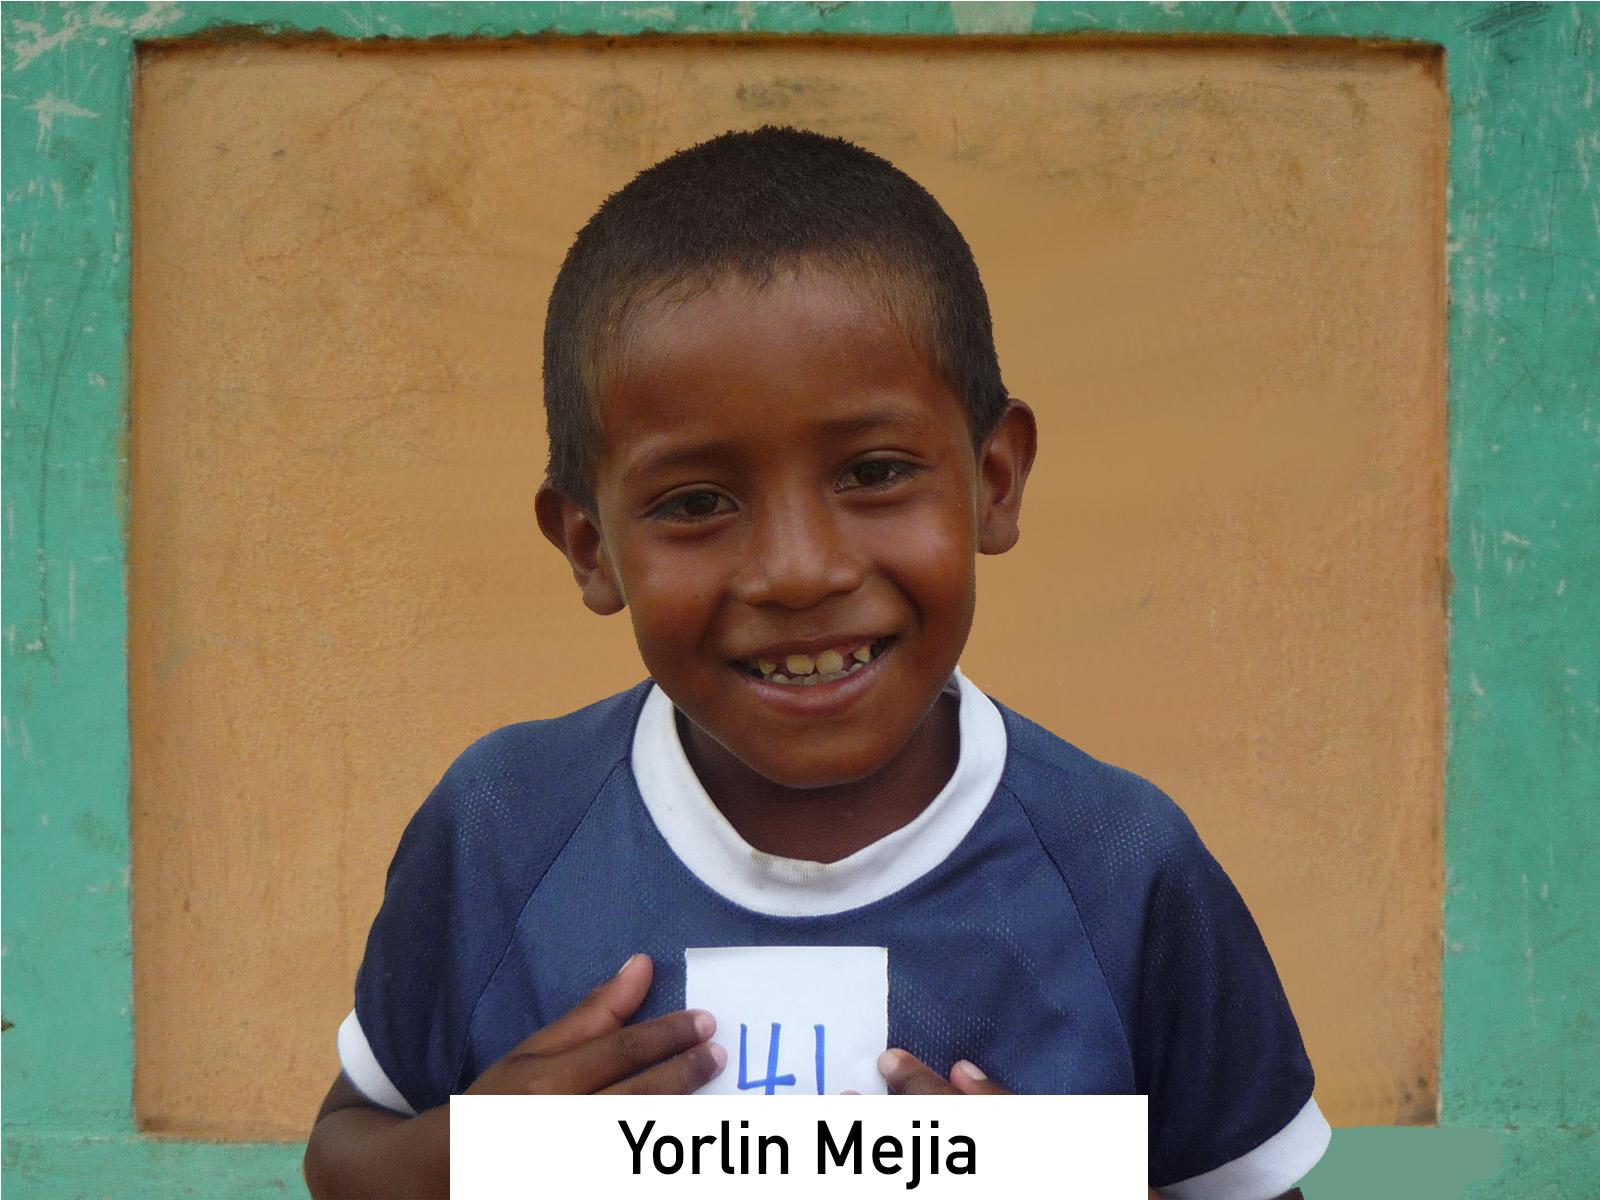 041 - Yorlin Mejia.jpg